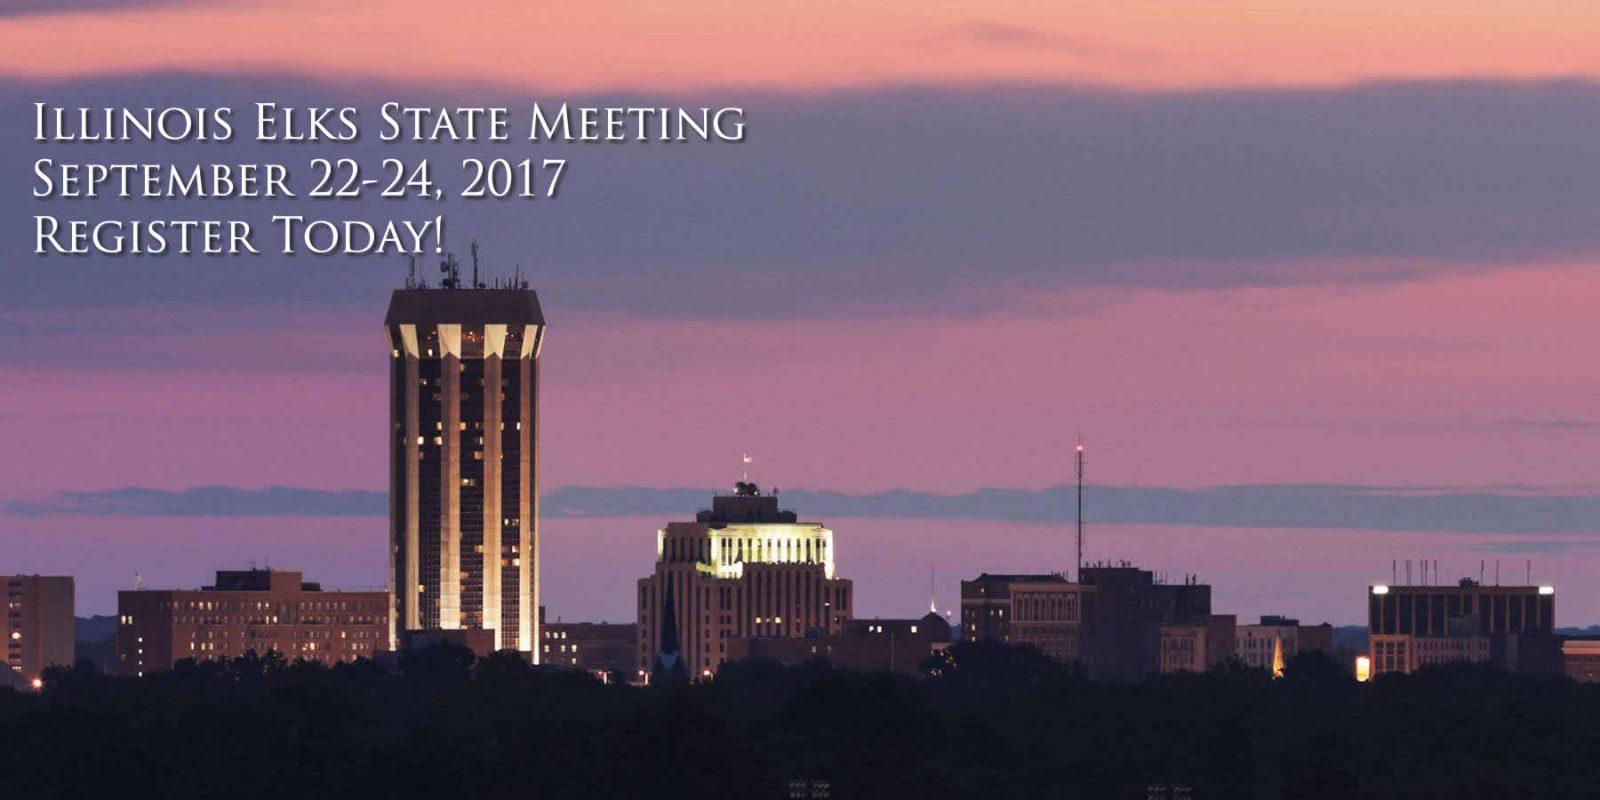 Register for the IEA September 2017 Meeting